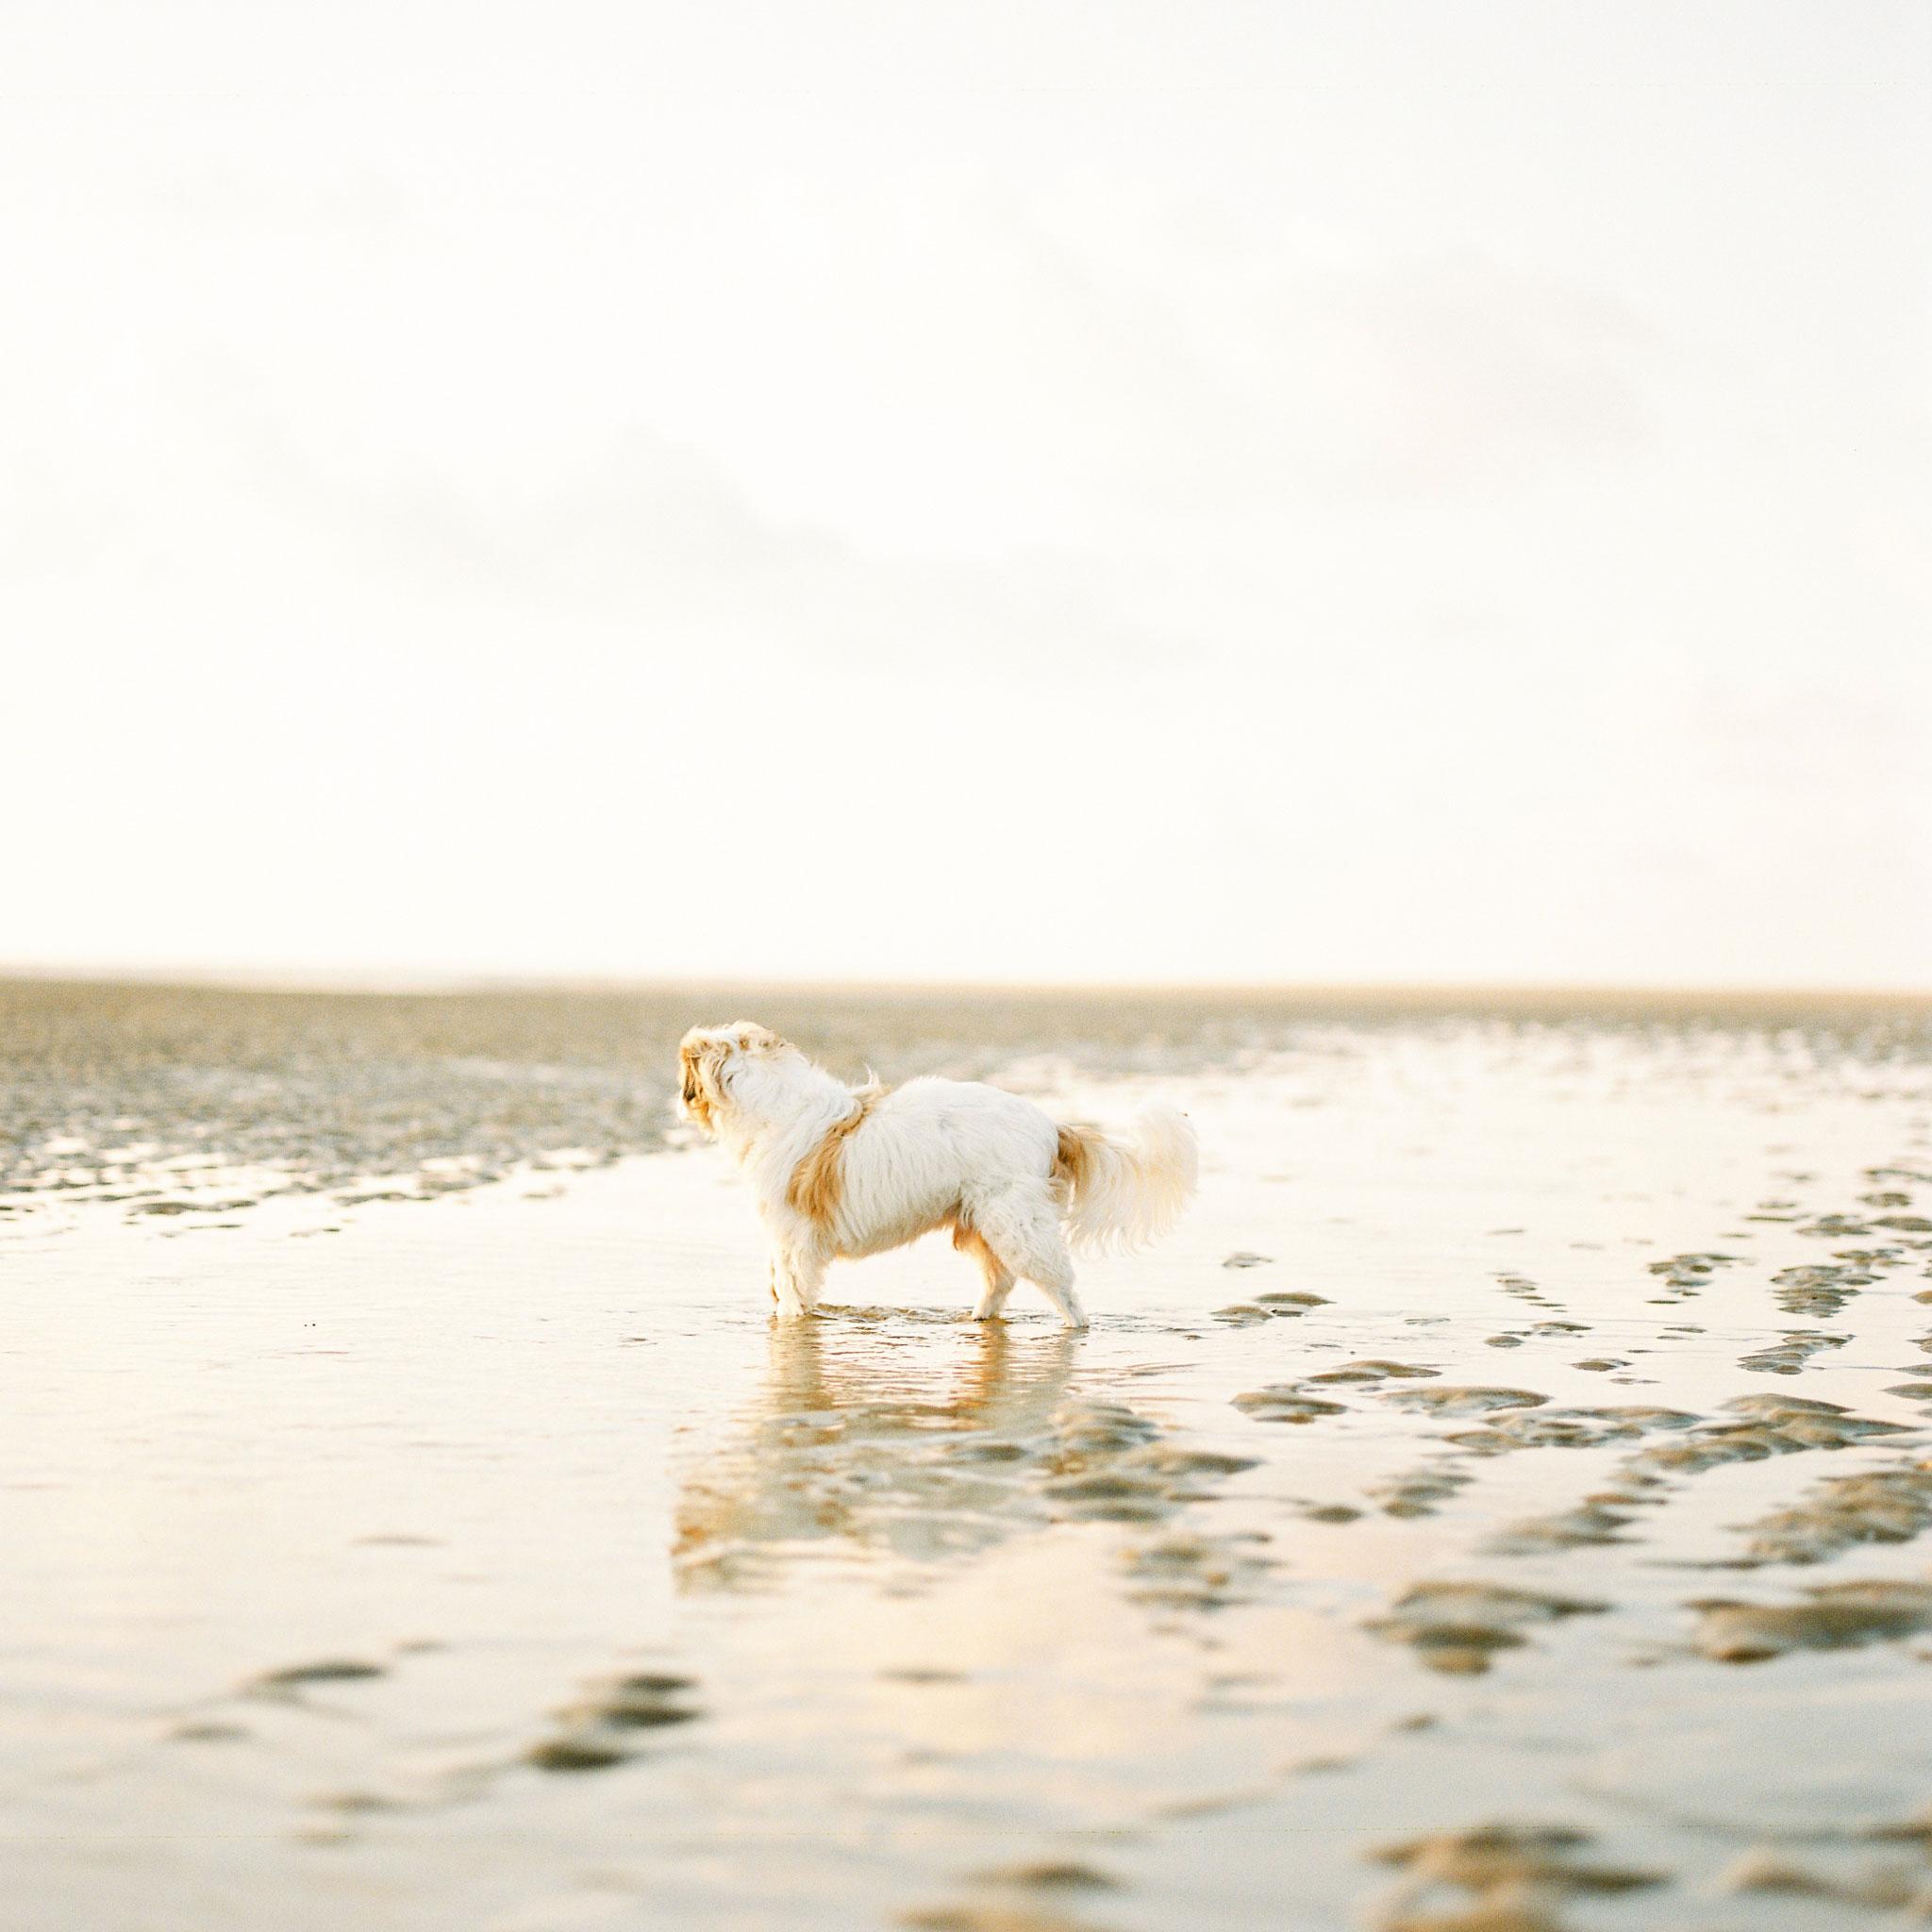 Nils Karlson | The Sigh Of Summer | Mamiya RZ67 - 110mm | Portra 800